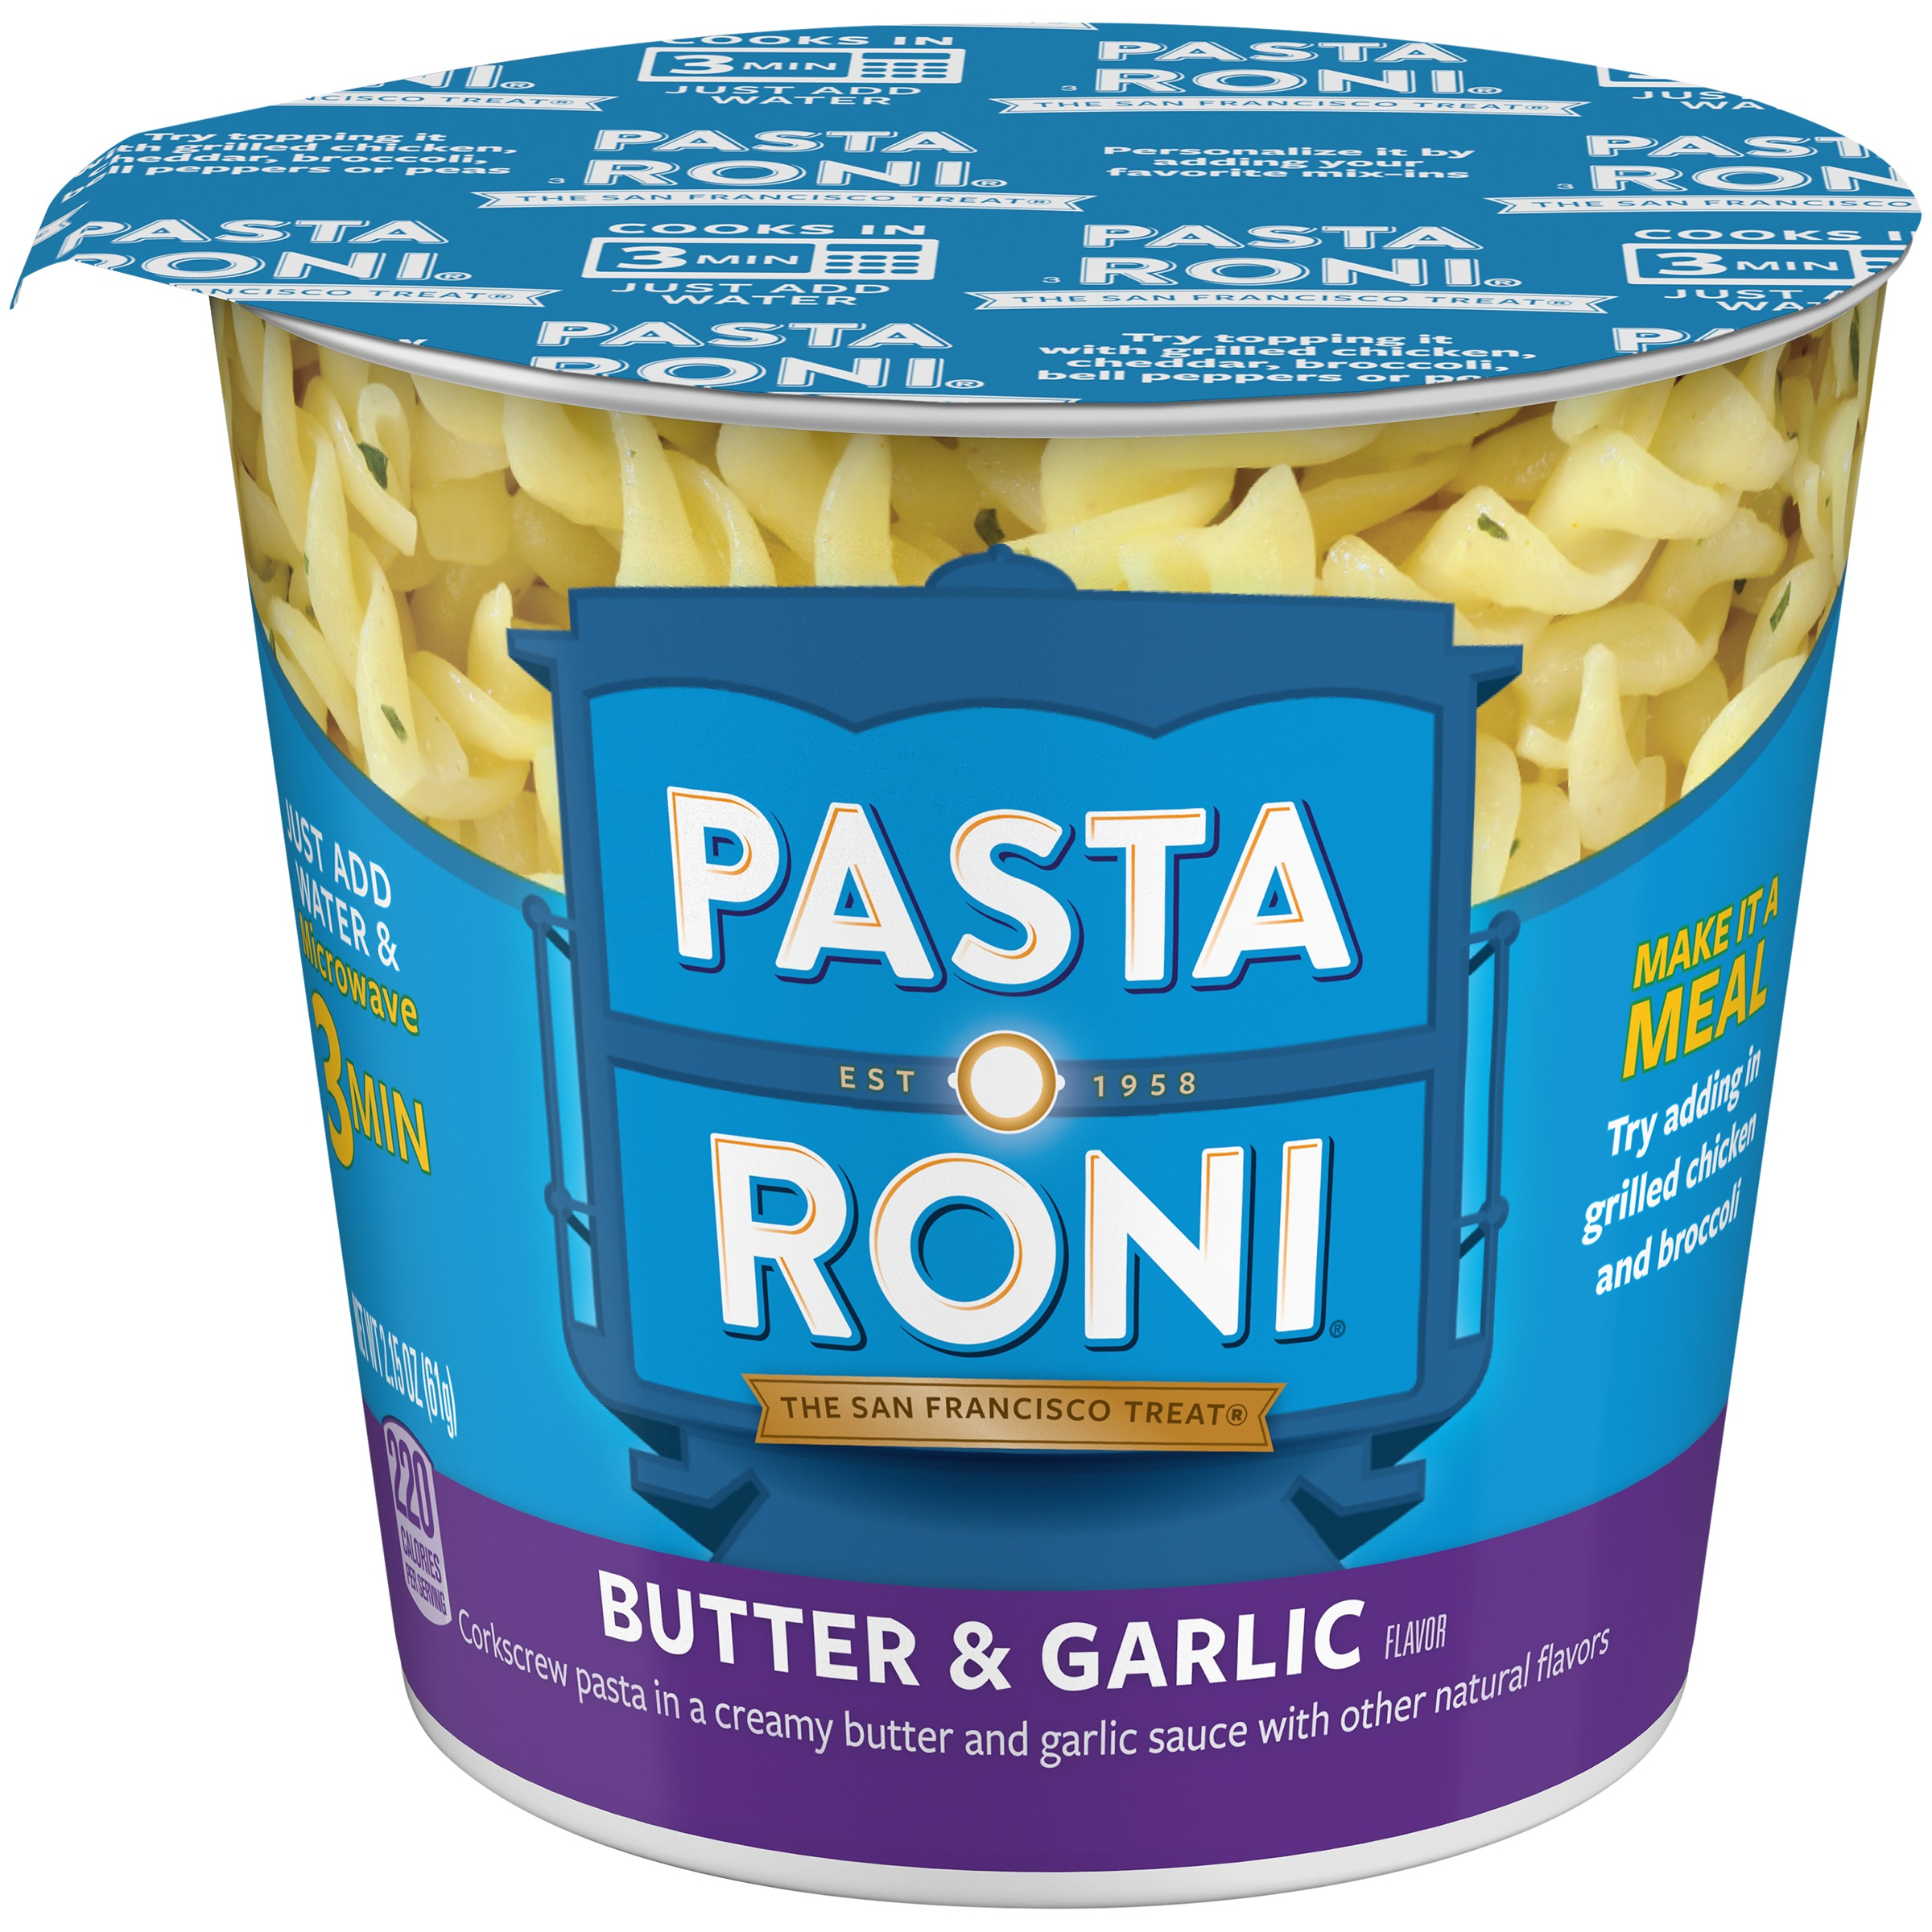 (8 Pack) Pasta Roni Butter & Garlic Corkscrew Pasta, 2.15 oz Cup